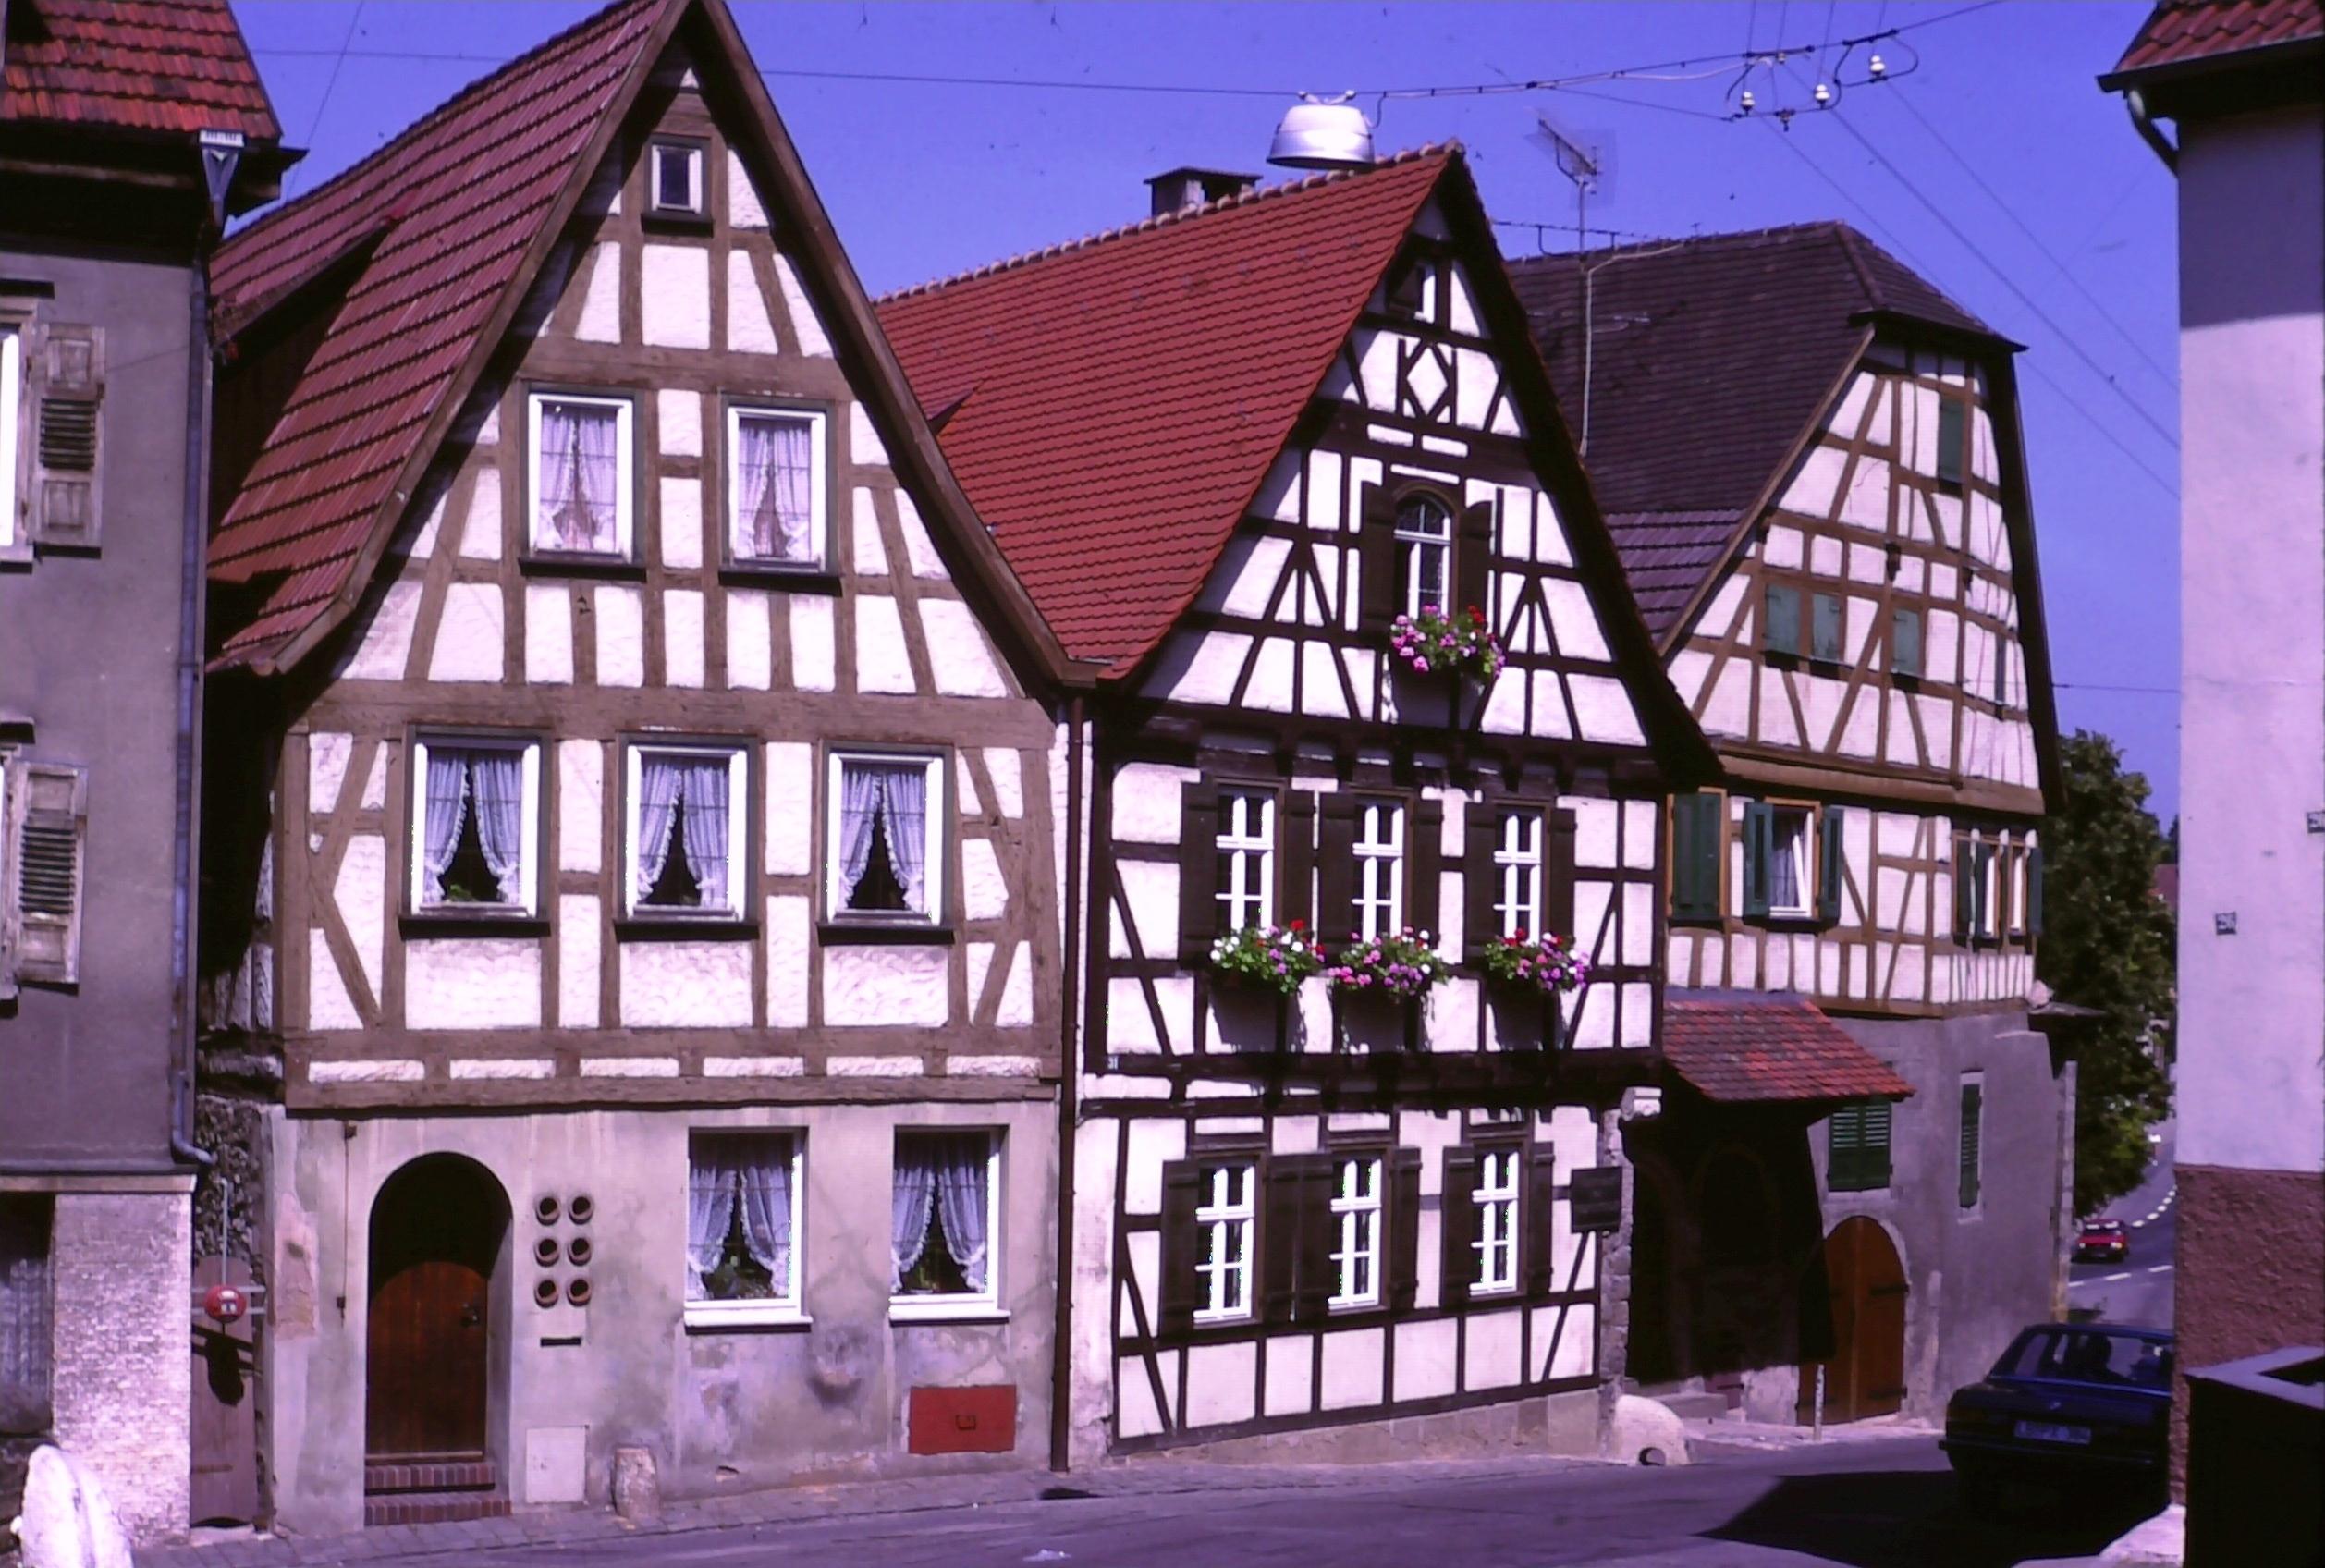 file half timbered houses marbach am neckar jpg wikimedia commons. Black Bedroom Furniture Sets. Home Design Ideas